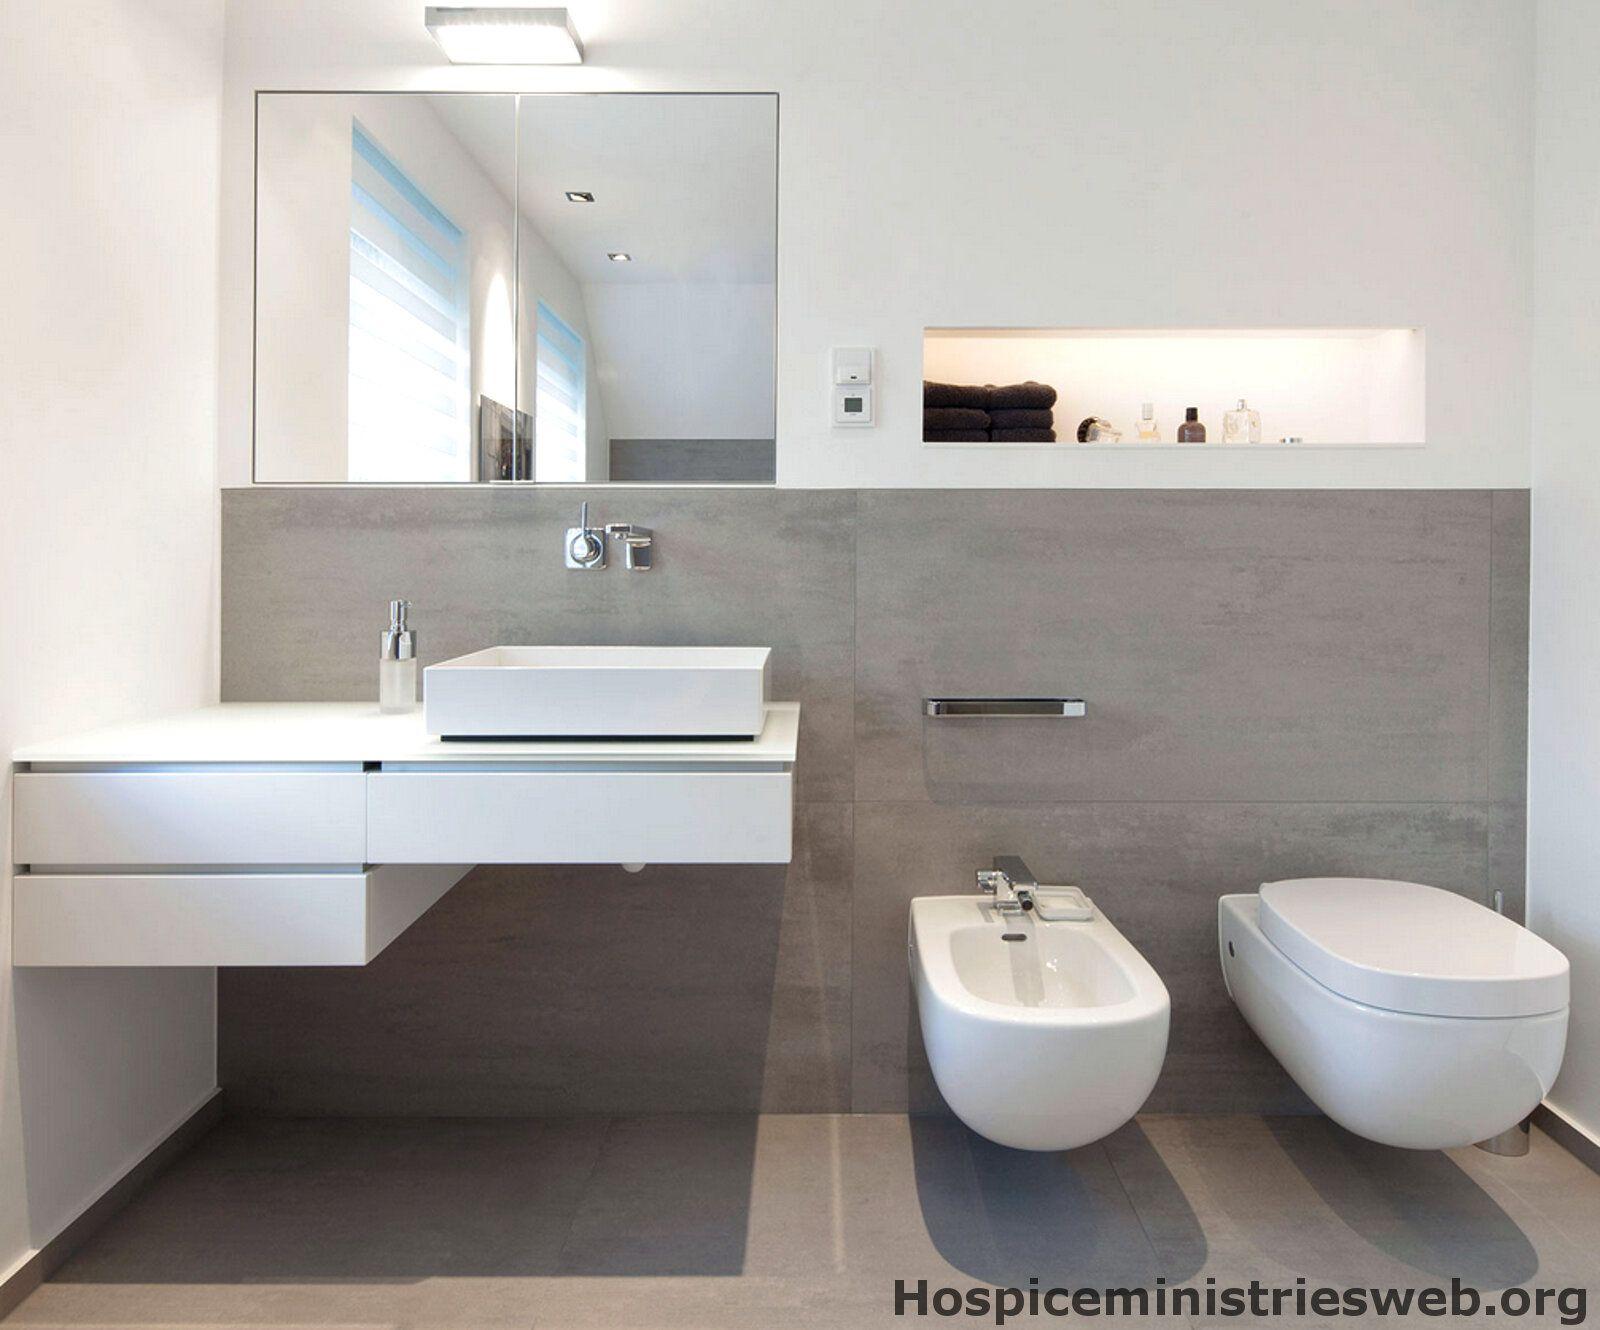 35 ideen f r badezimmer braun beige wohn ideen ideen f r badezimmer braun beige pinterest. Black Bedroom Furniture Sets. Home Design Ideas